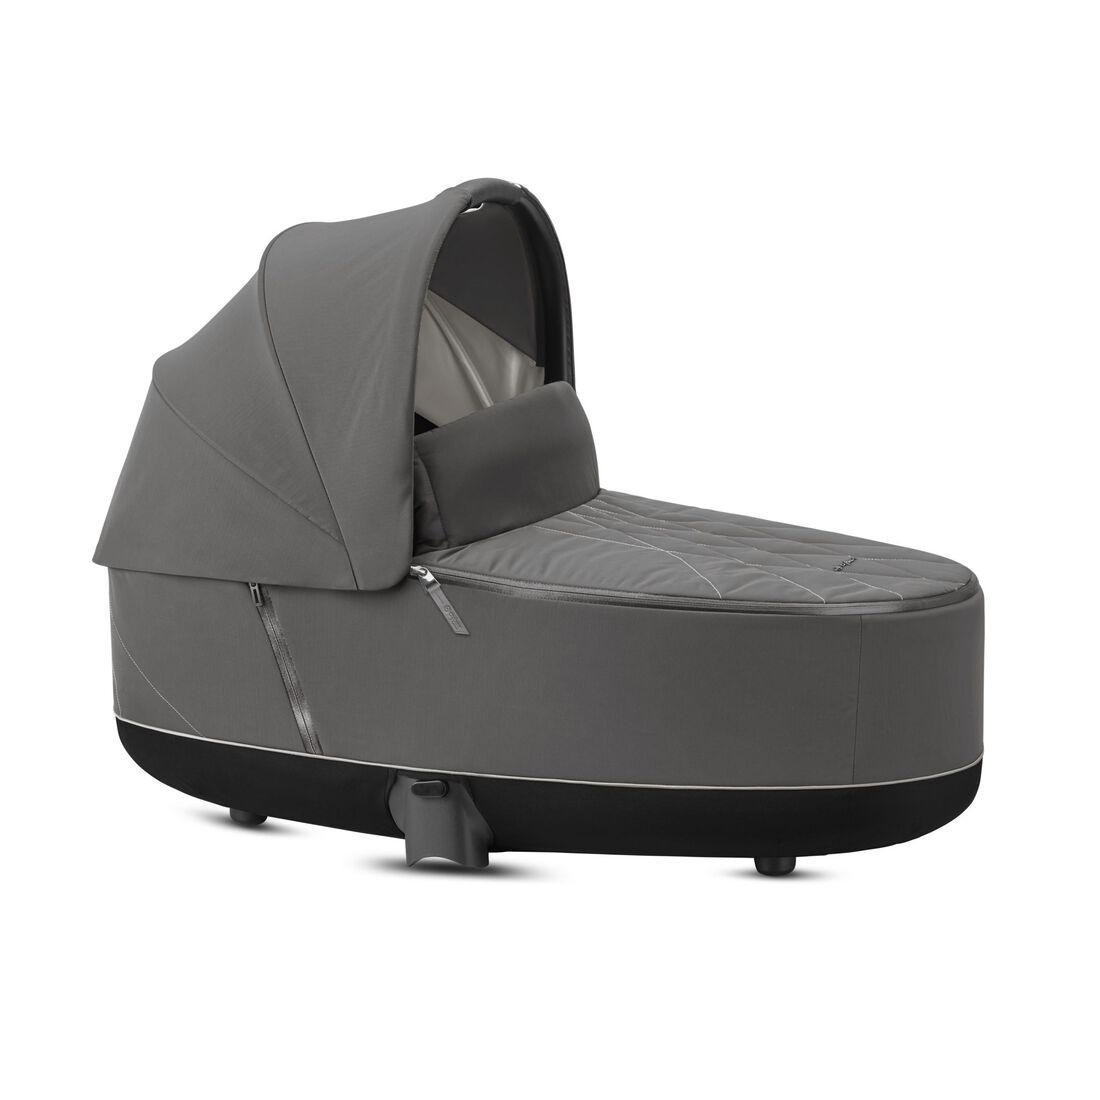 CYBEX Priam Lux Carry Cot - Soho Grey in Soho Grey large Bild 1